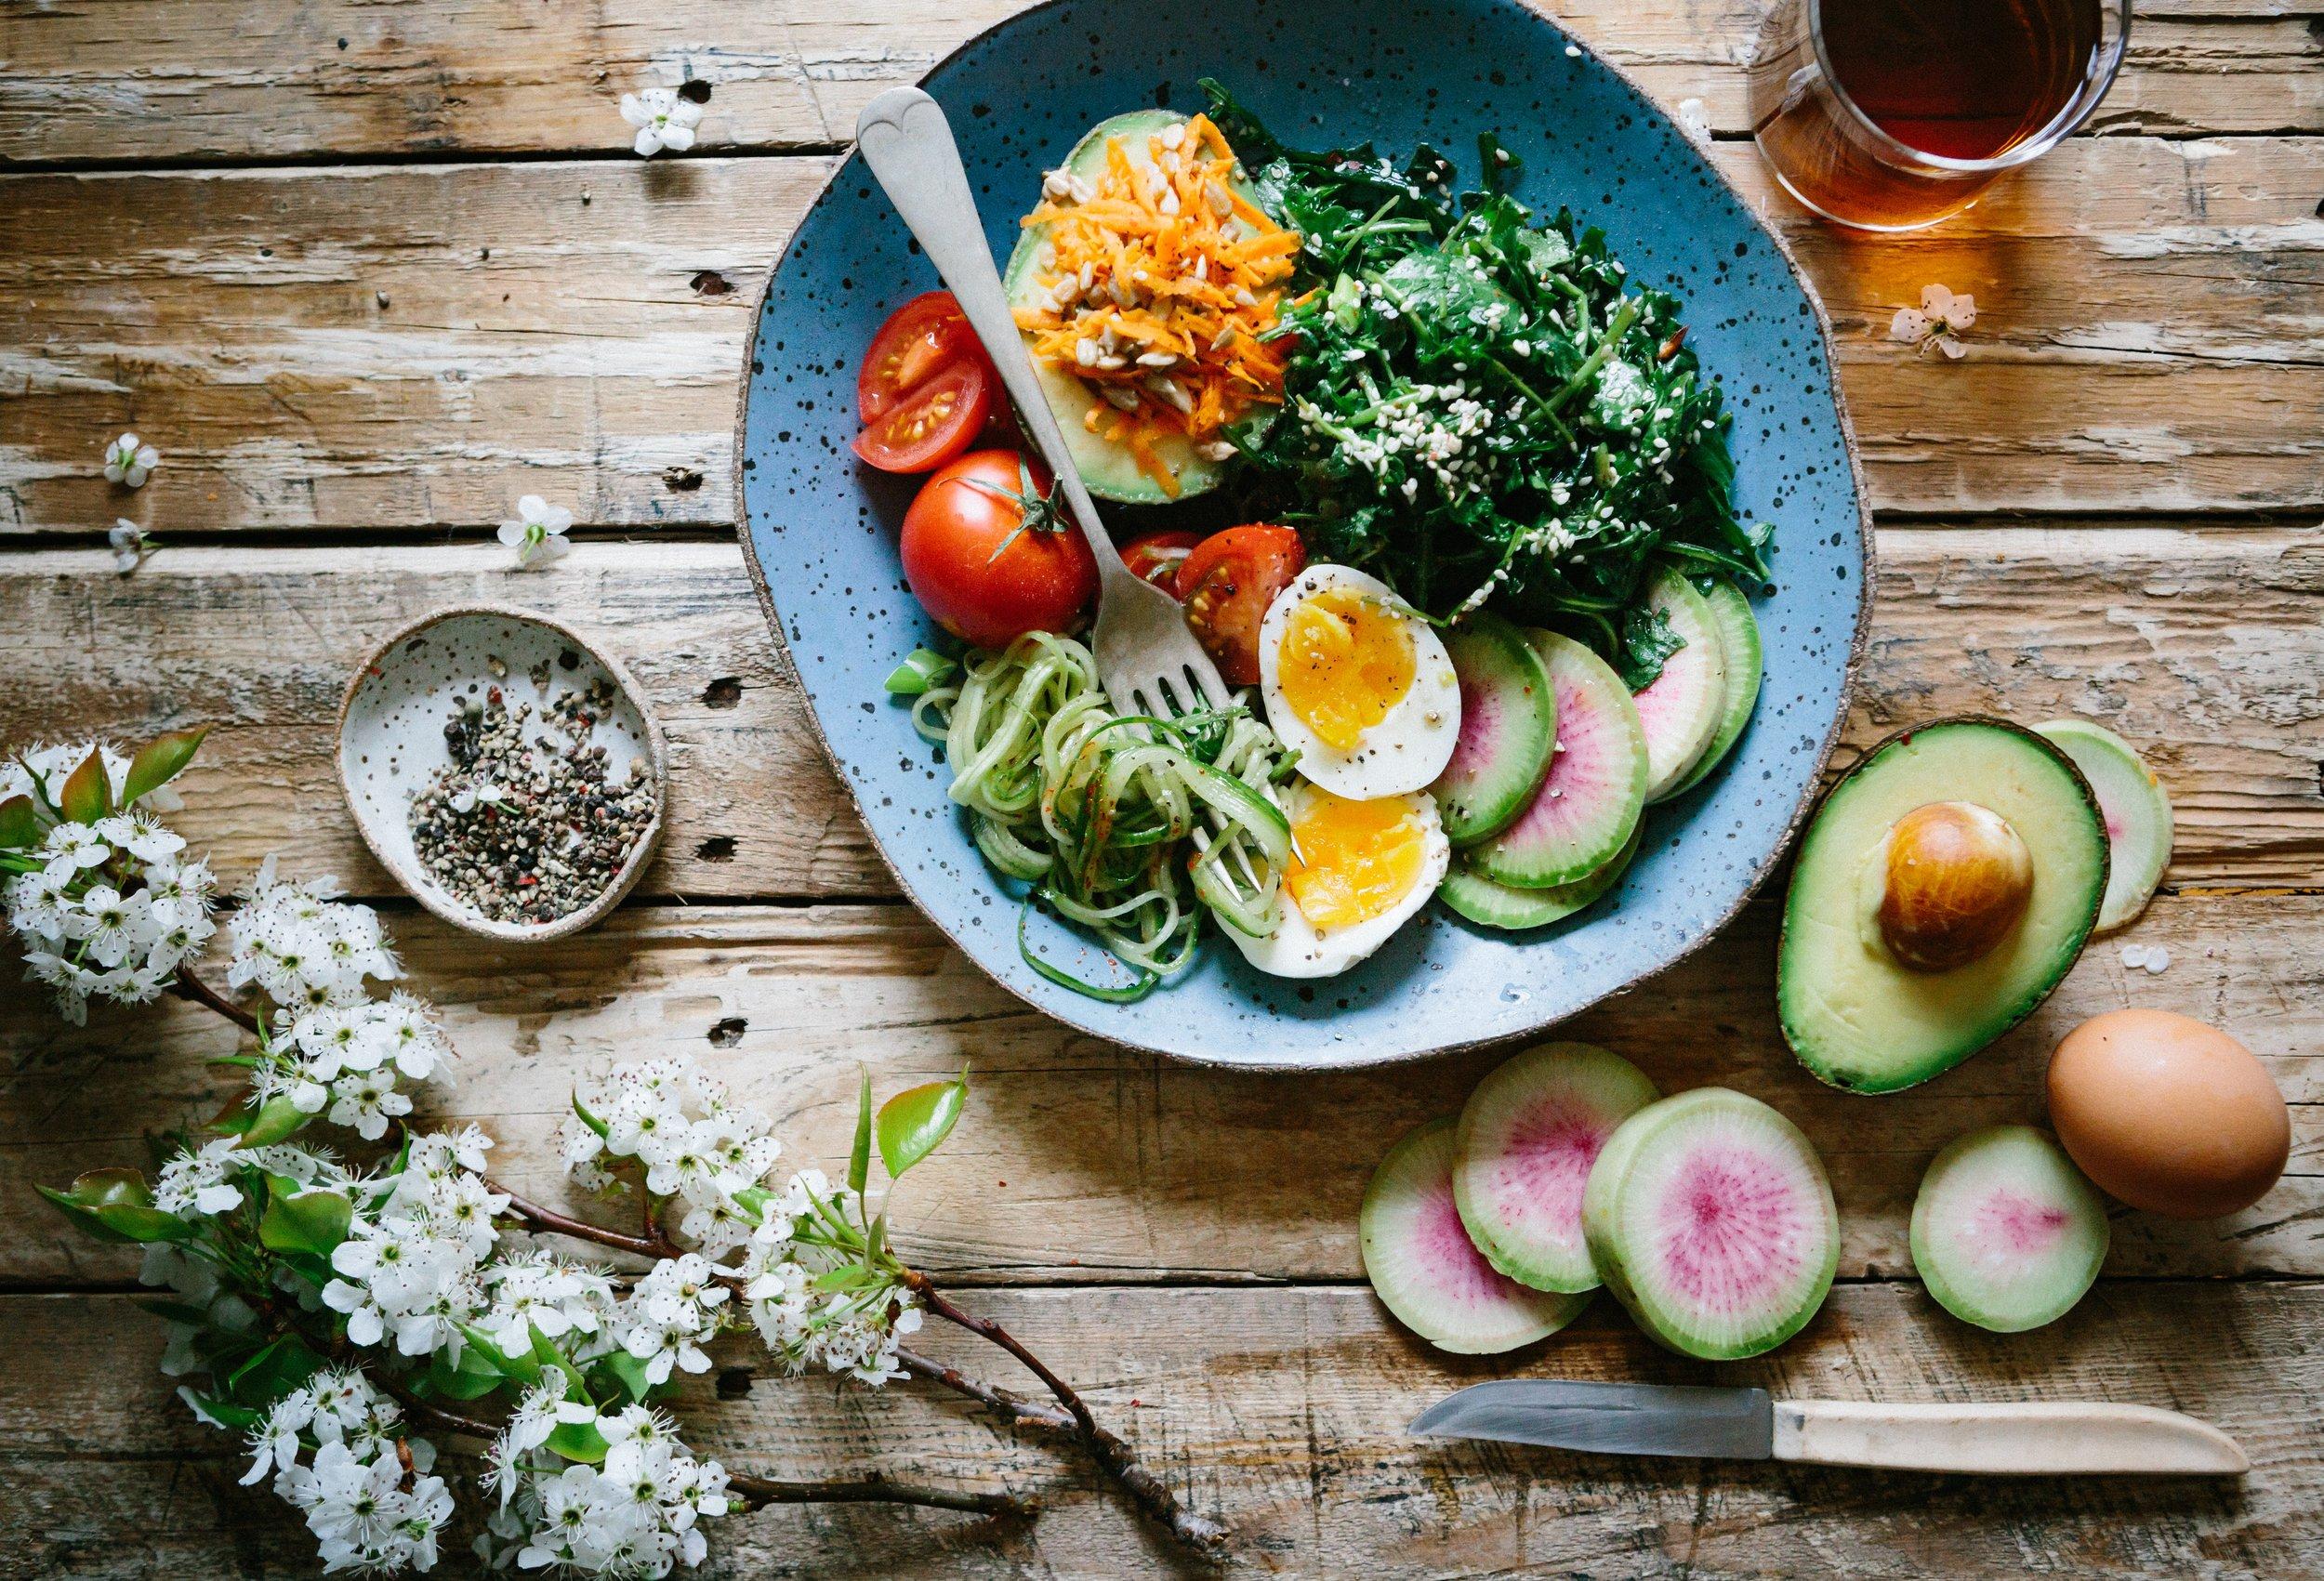 Eat Healthy Fats - HEALTHY LIVING HABIT #6